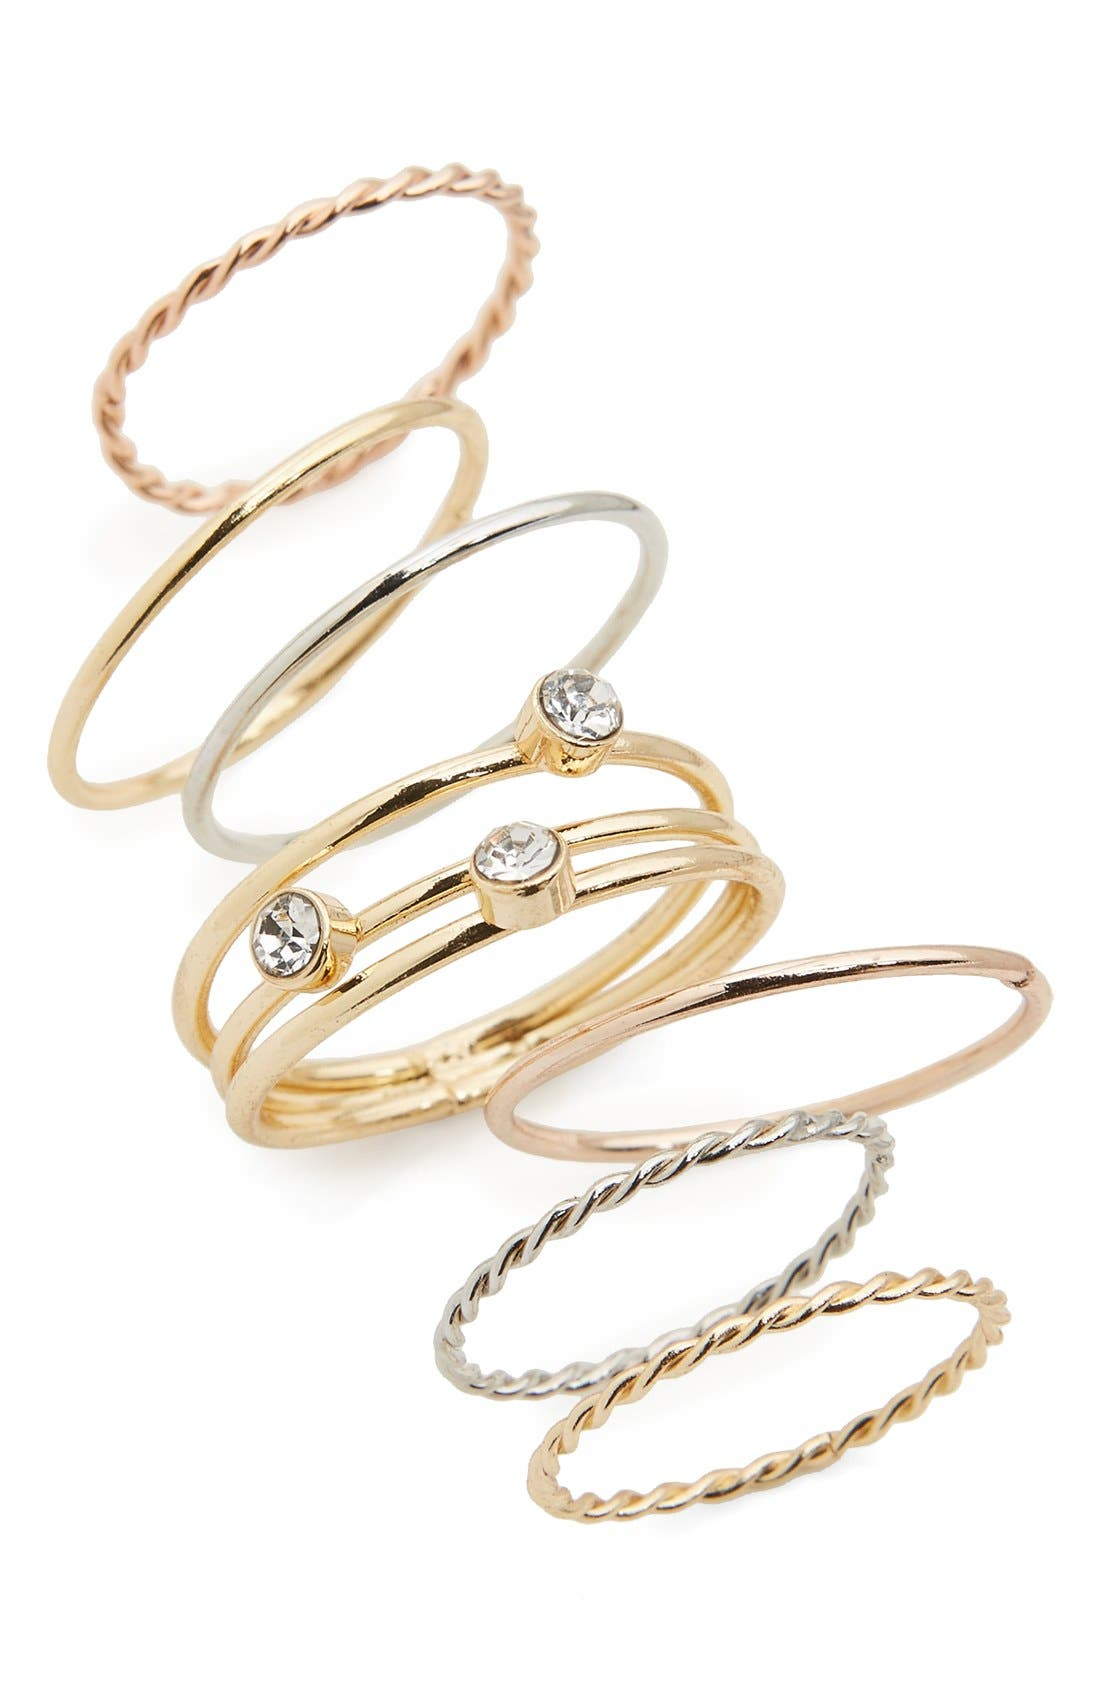 Alternate Image 1 Selected - BP. Set of 7 Assorted Rings